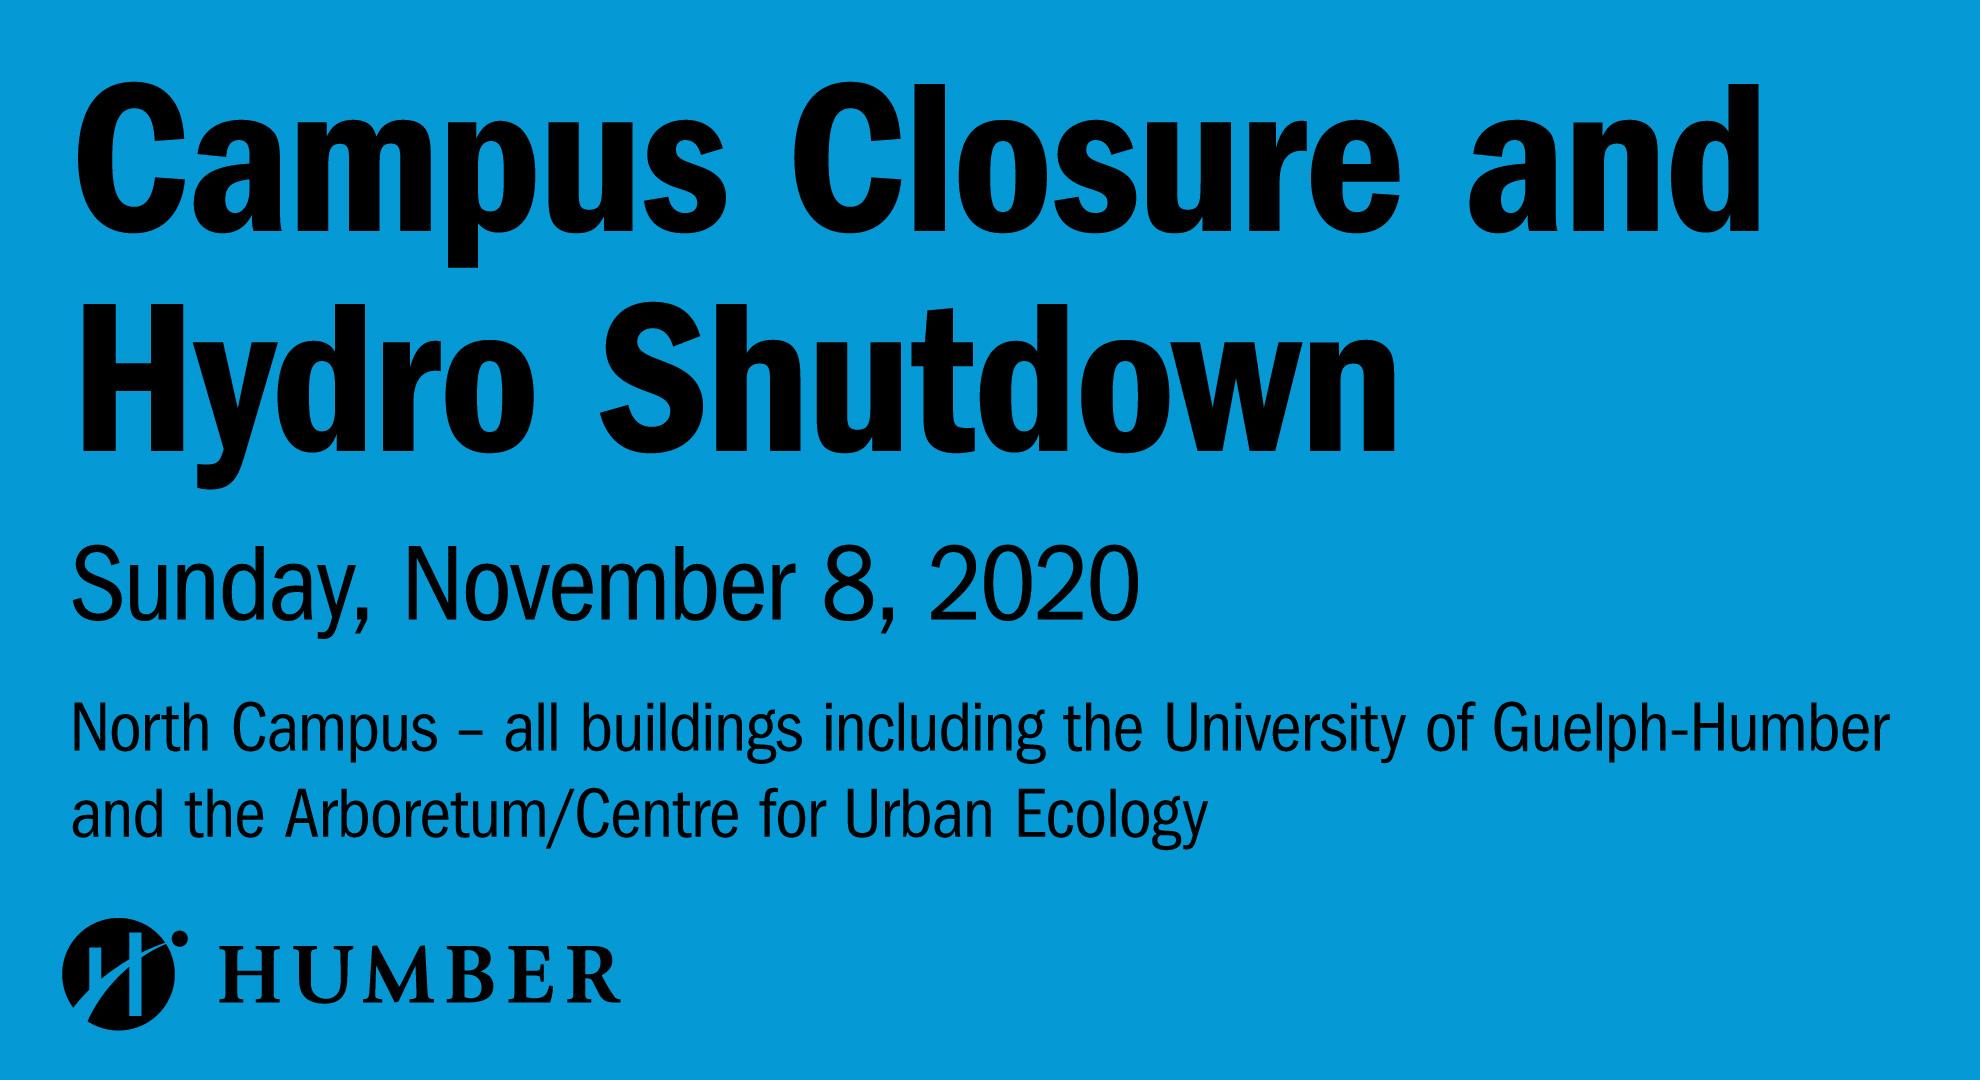 Campus Closure and Hydro Shutdown